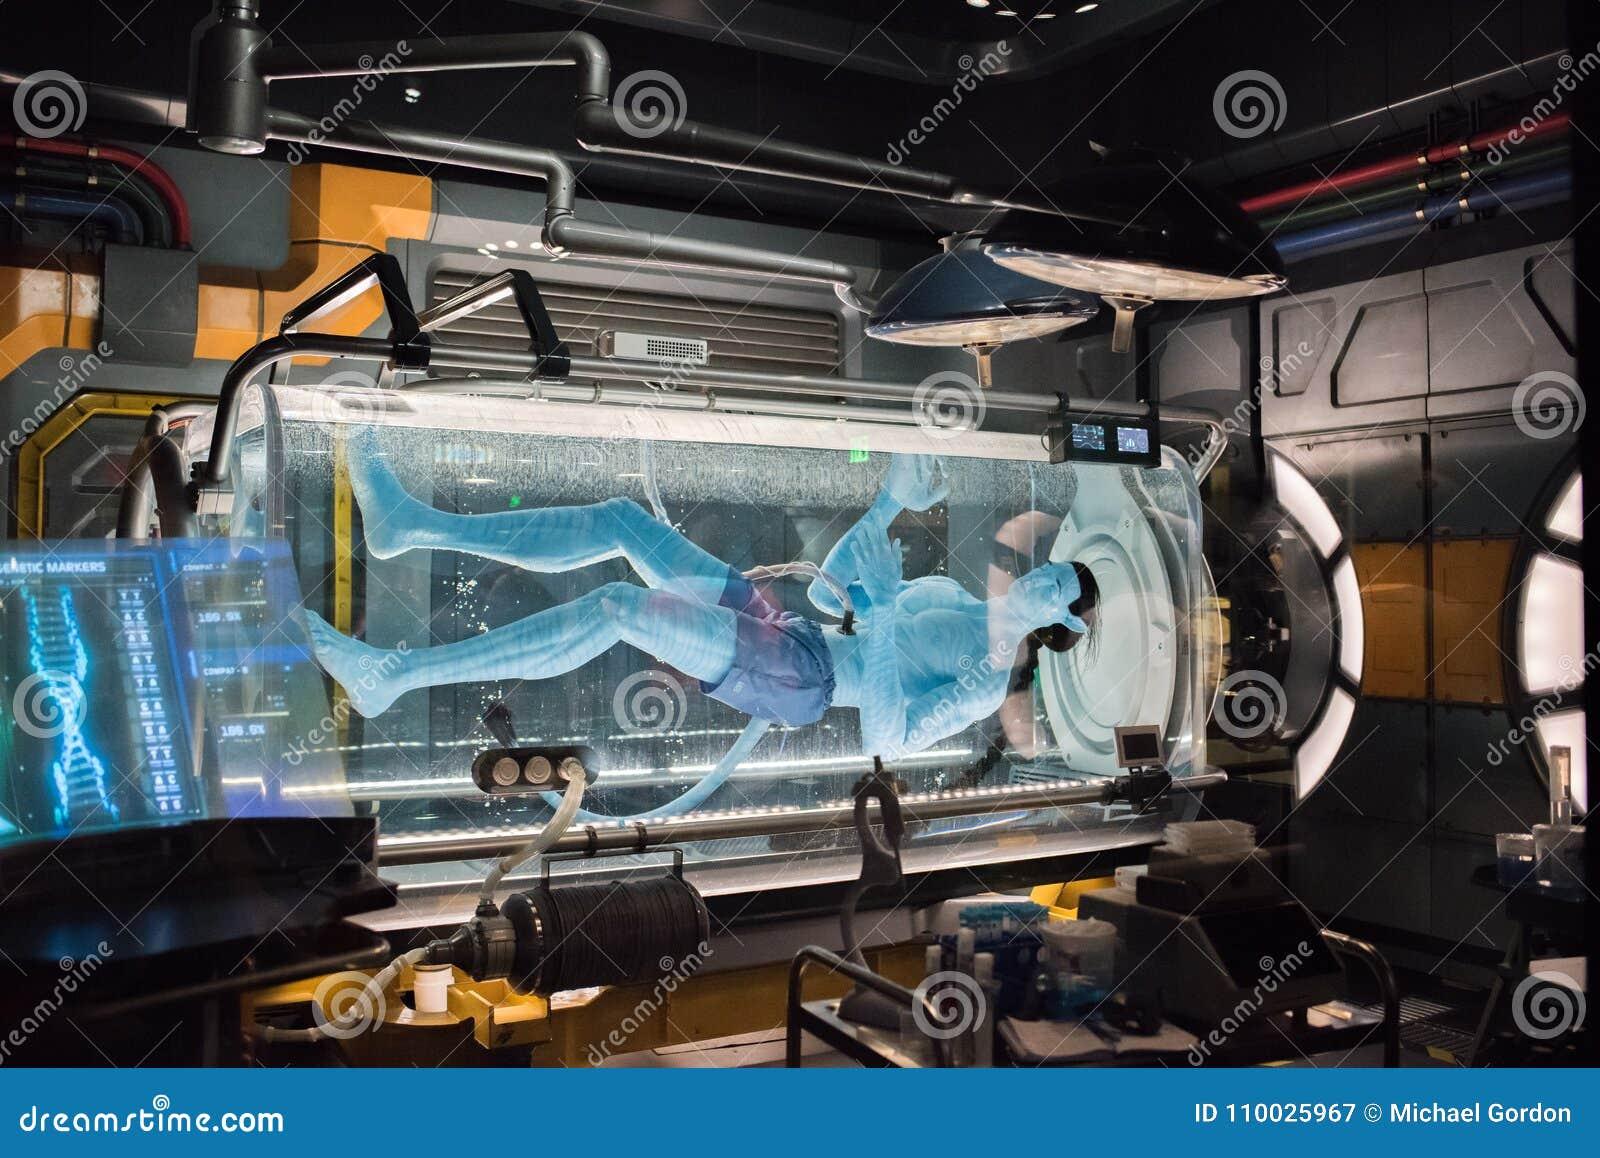 Pandora – The World of Avatar at the Animal Kingdom at Walt Disney World